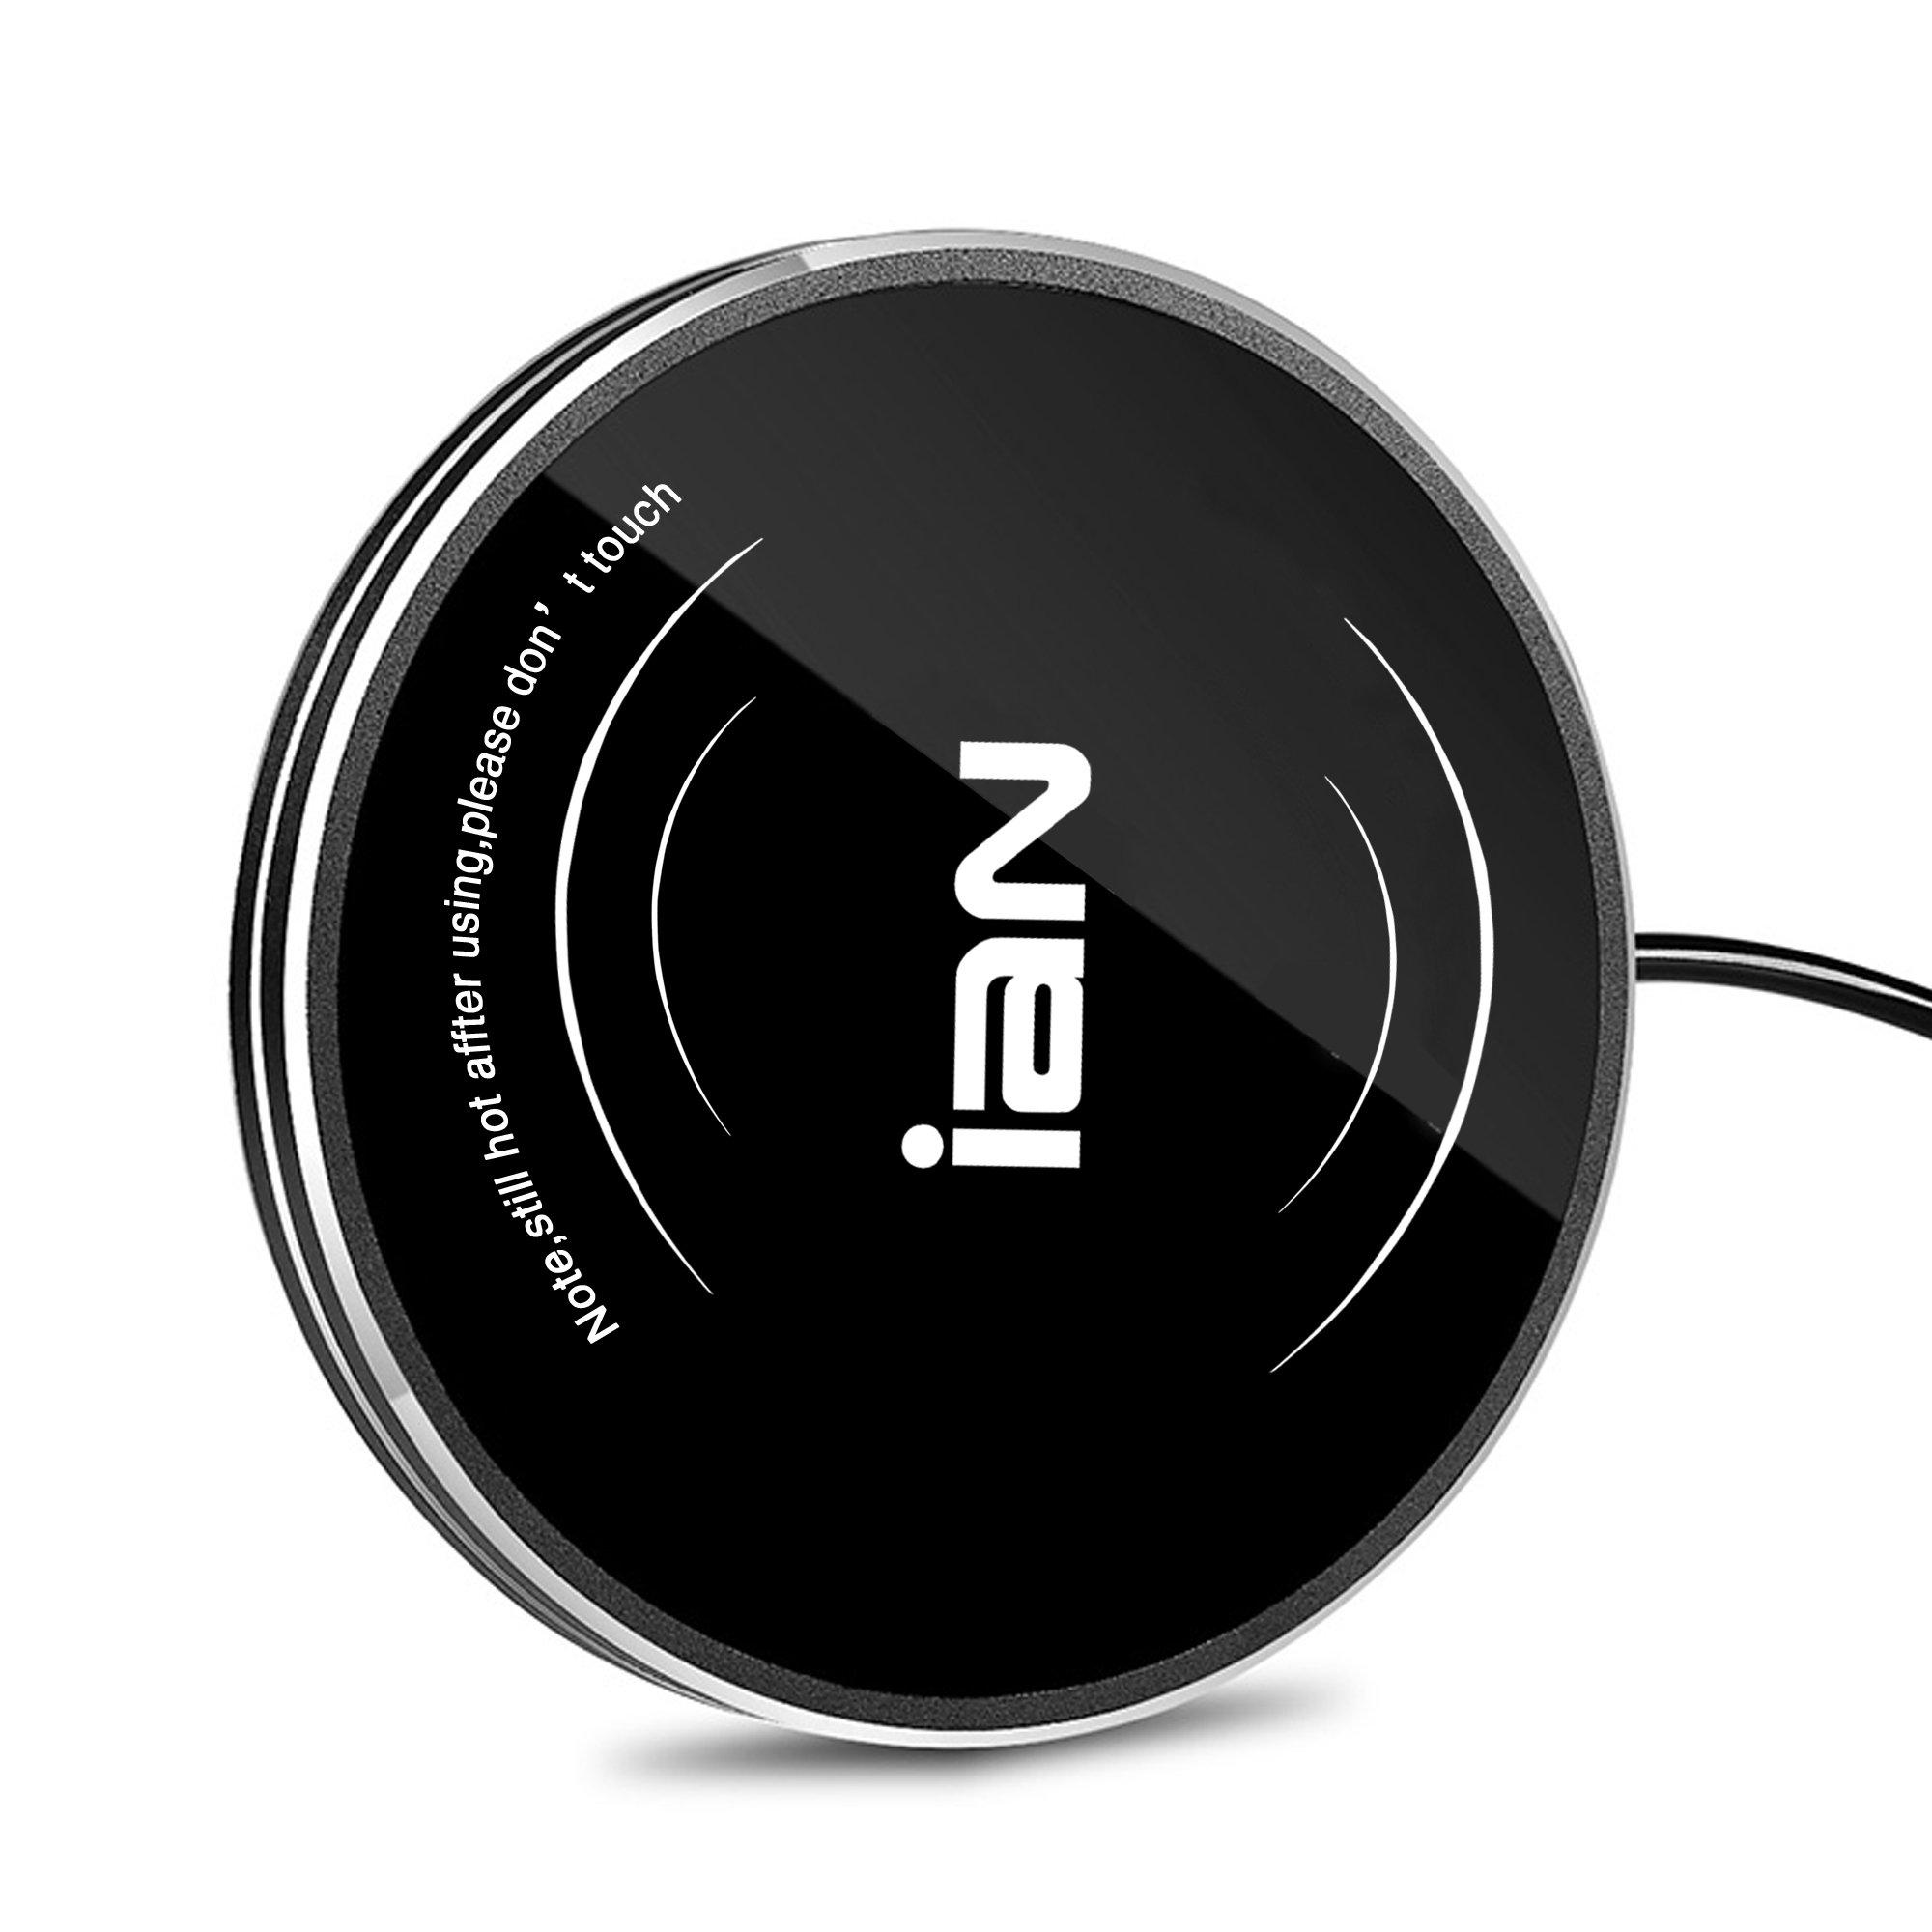 IAN Desktop Coffee Mug /Cup Warmer, Beverage Warmer for Office /Home Use (Black)